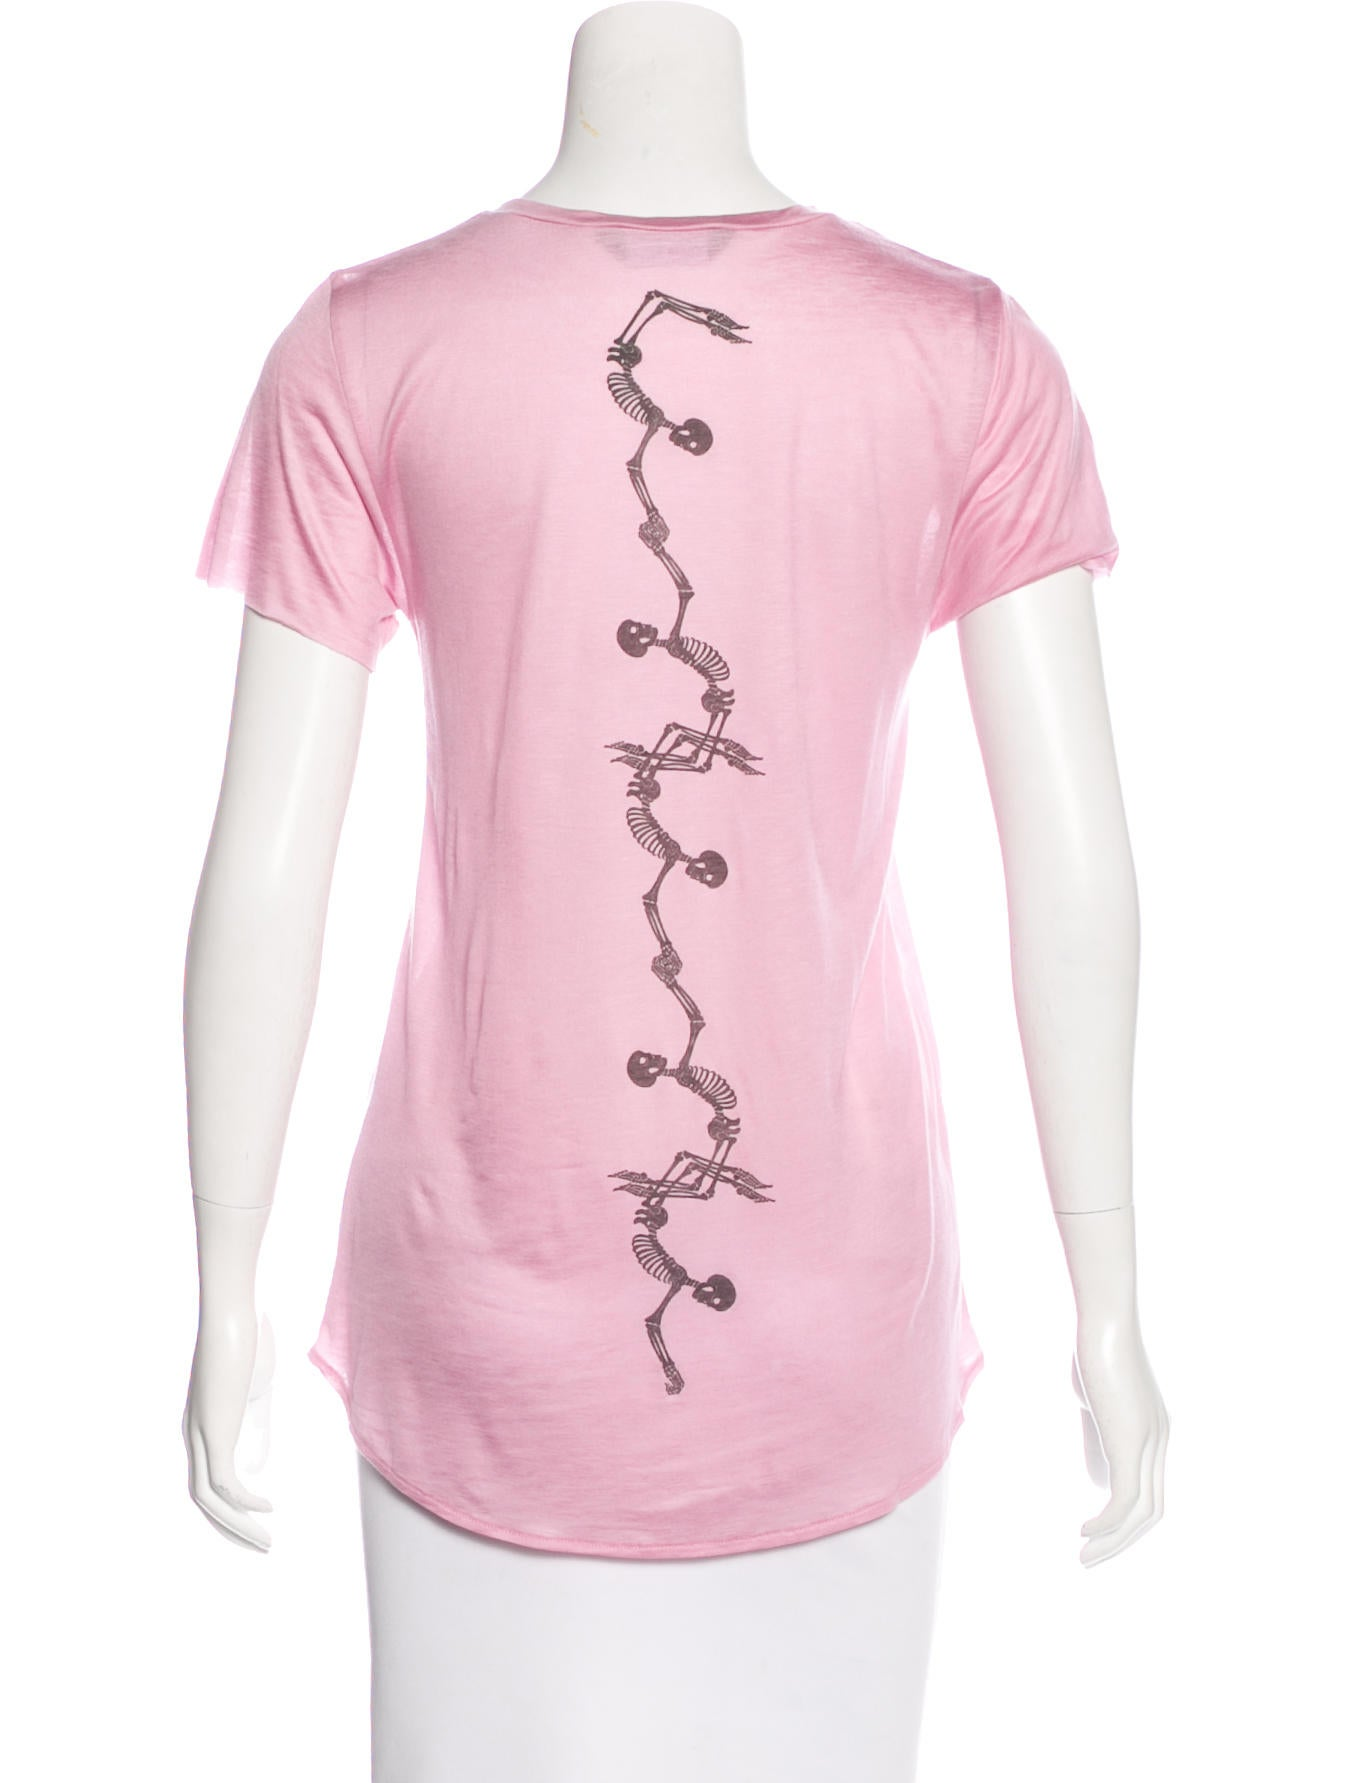 Thomas Wylde Printed Short Sleeve T Shirt Clothing